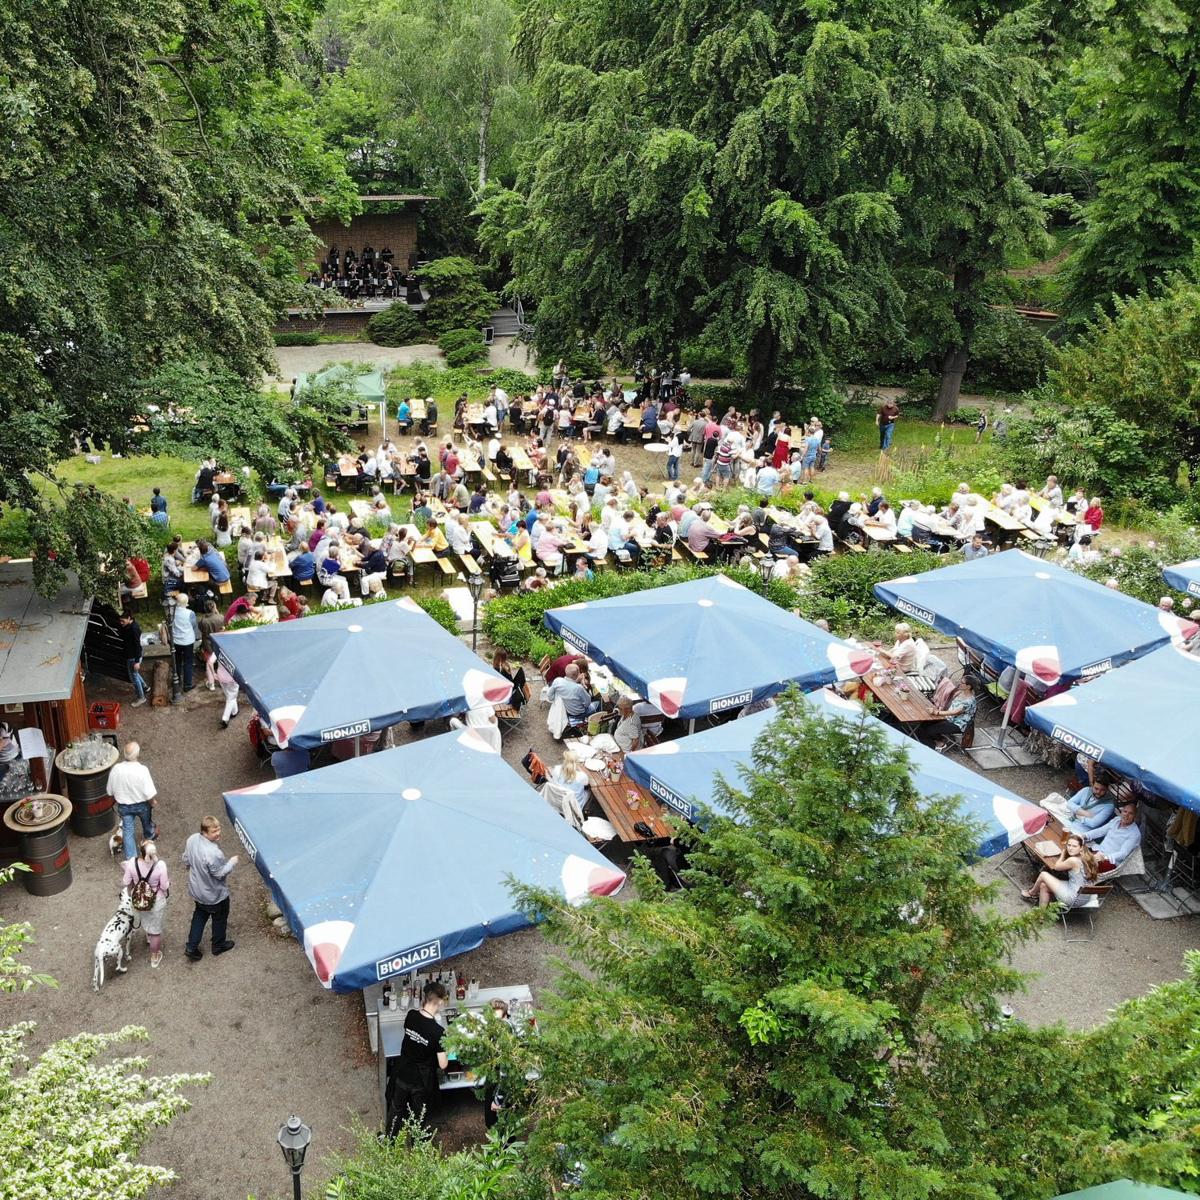 Biergarten am Herthasee in Berlin-3